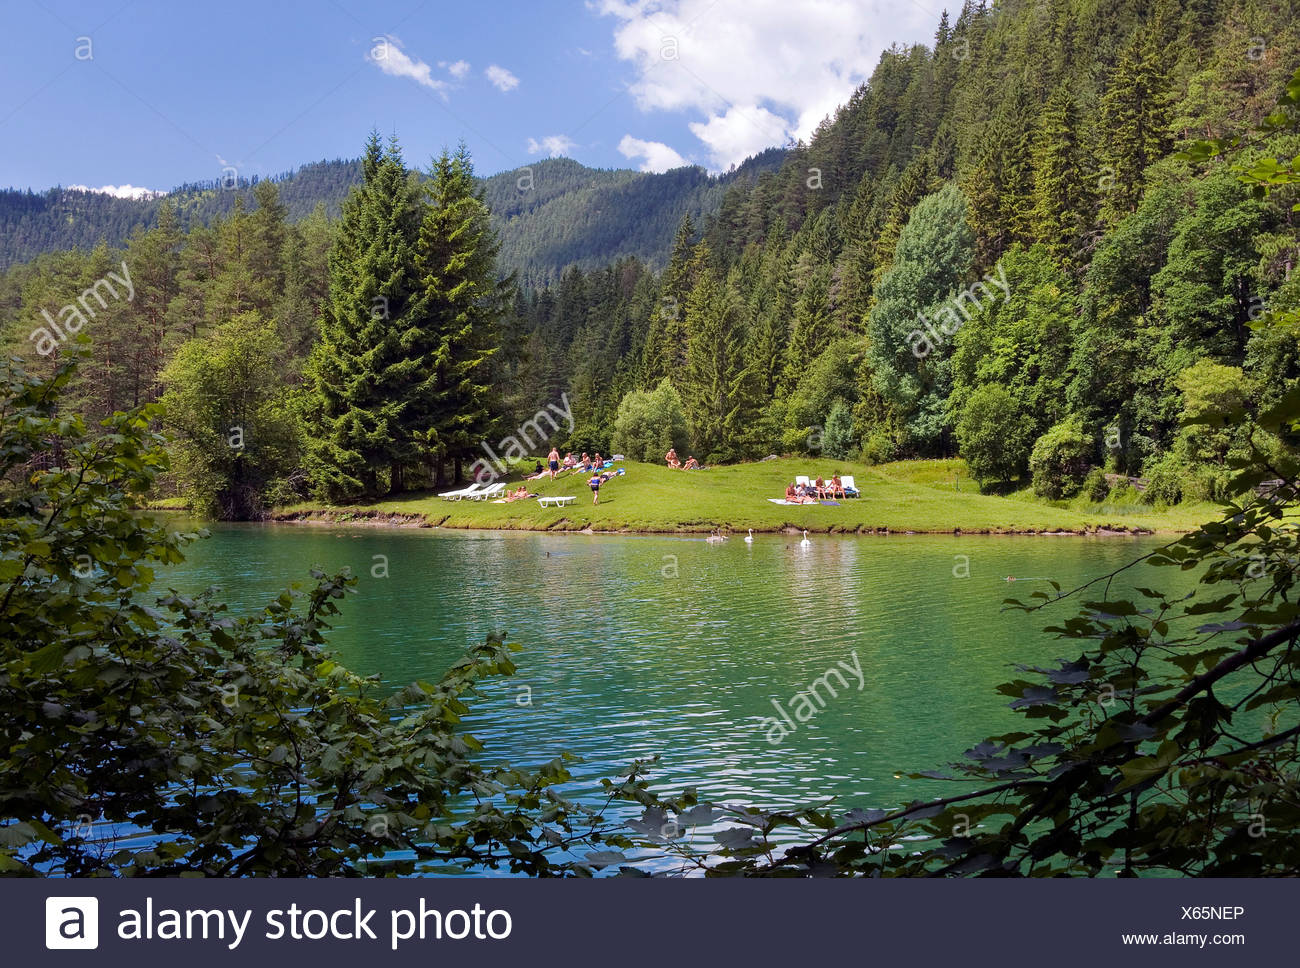 Fernsteinsee lake, bank, swimming guests, summer, Tirol, Austria, Europe - Stock Image